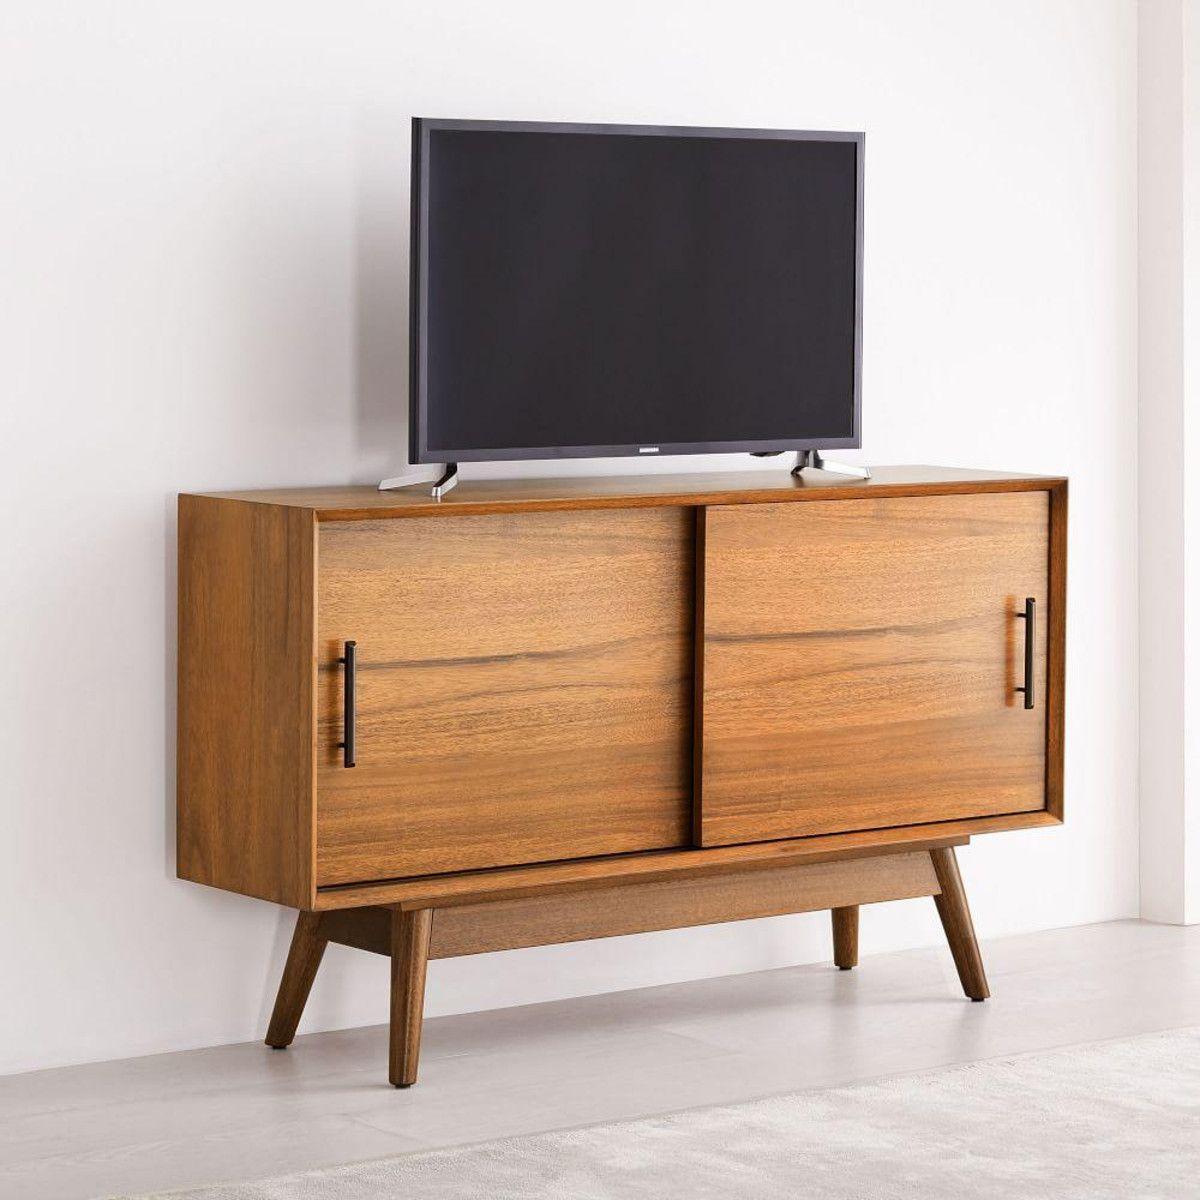 Best Mid Century Narrow Media Console 122 Cm Furniture 60S 400 x 300